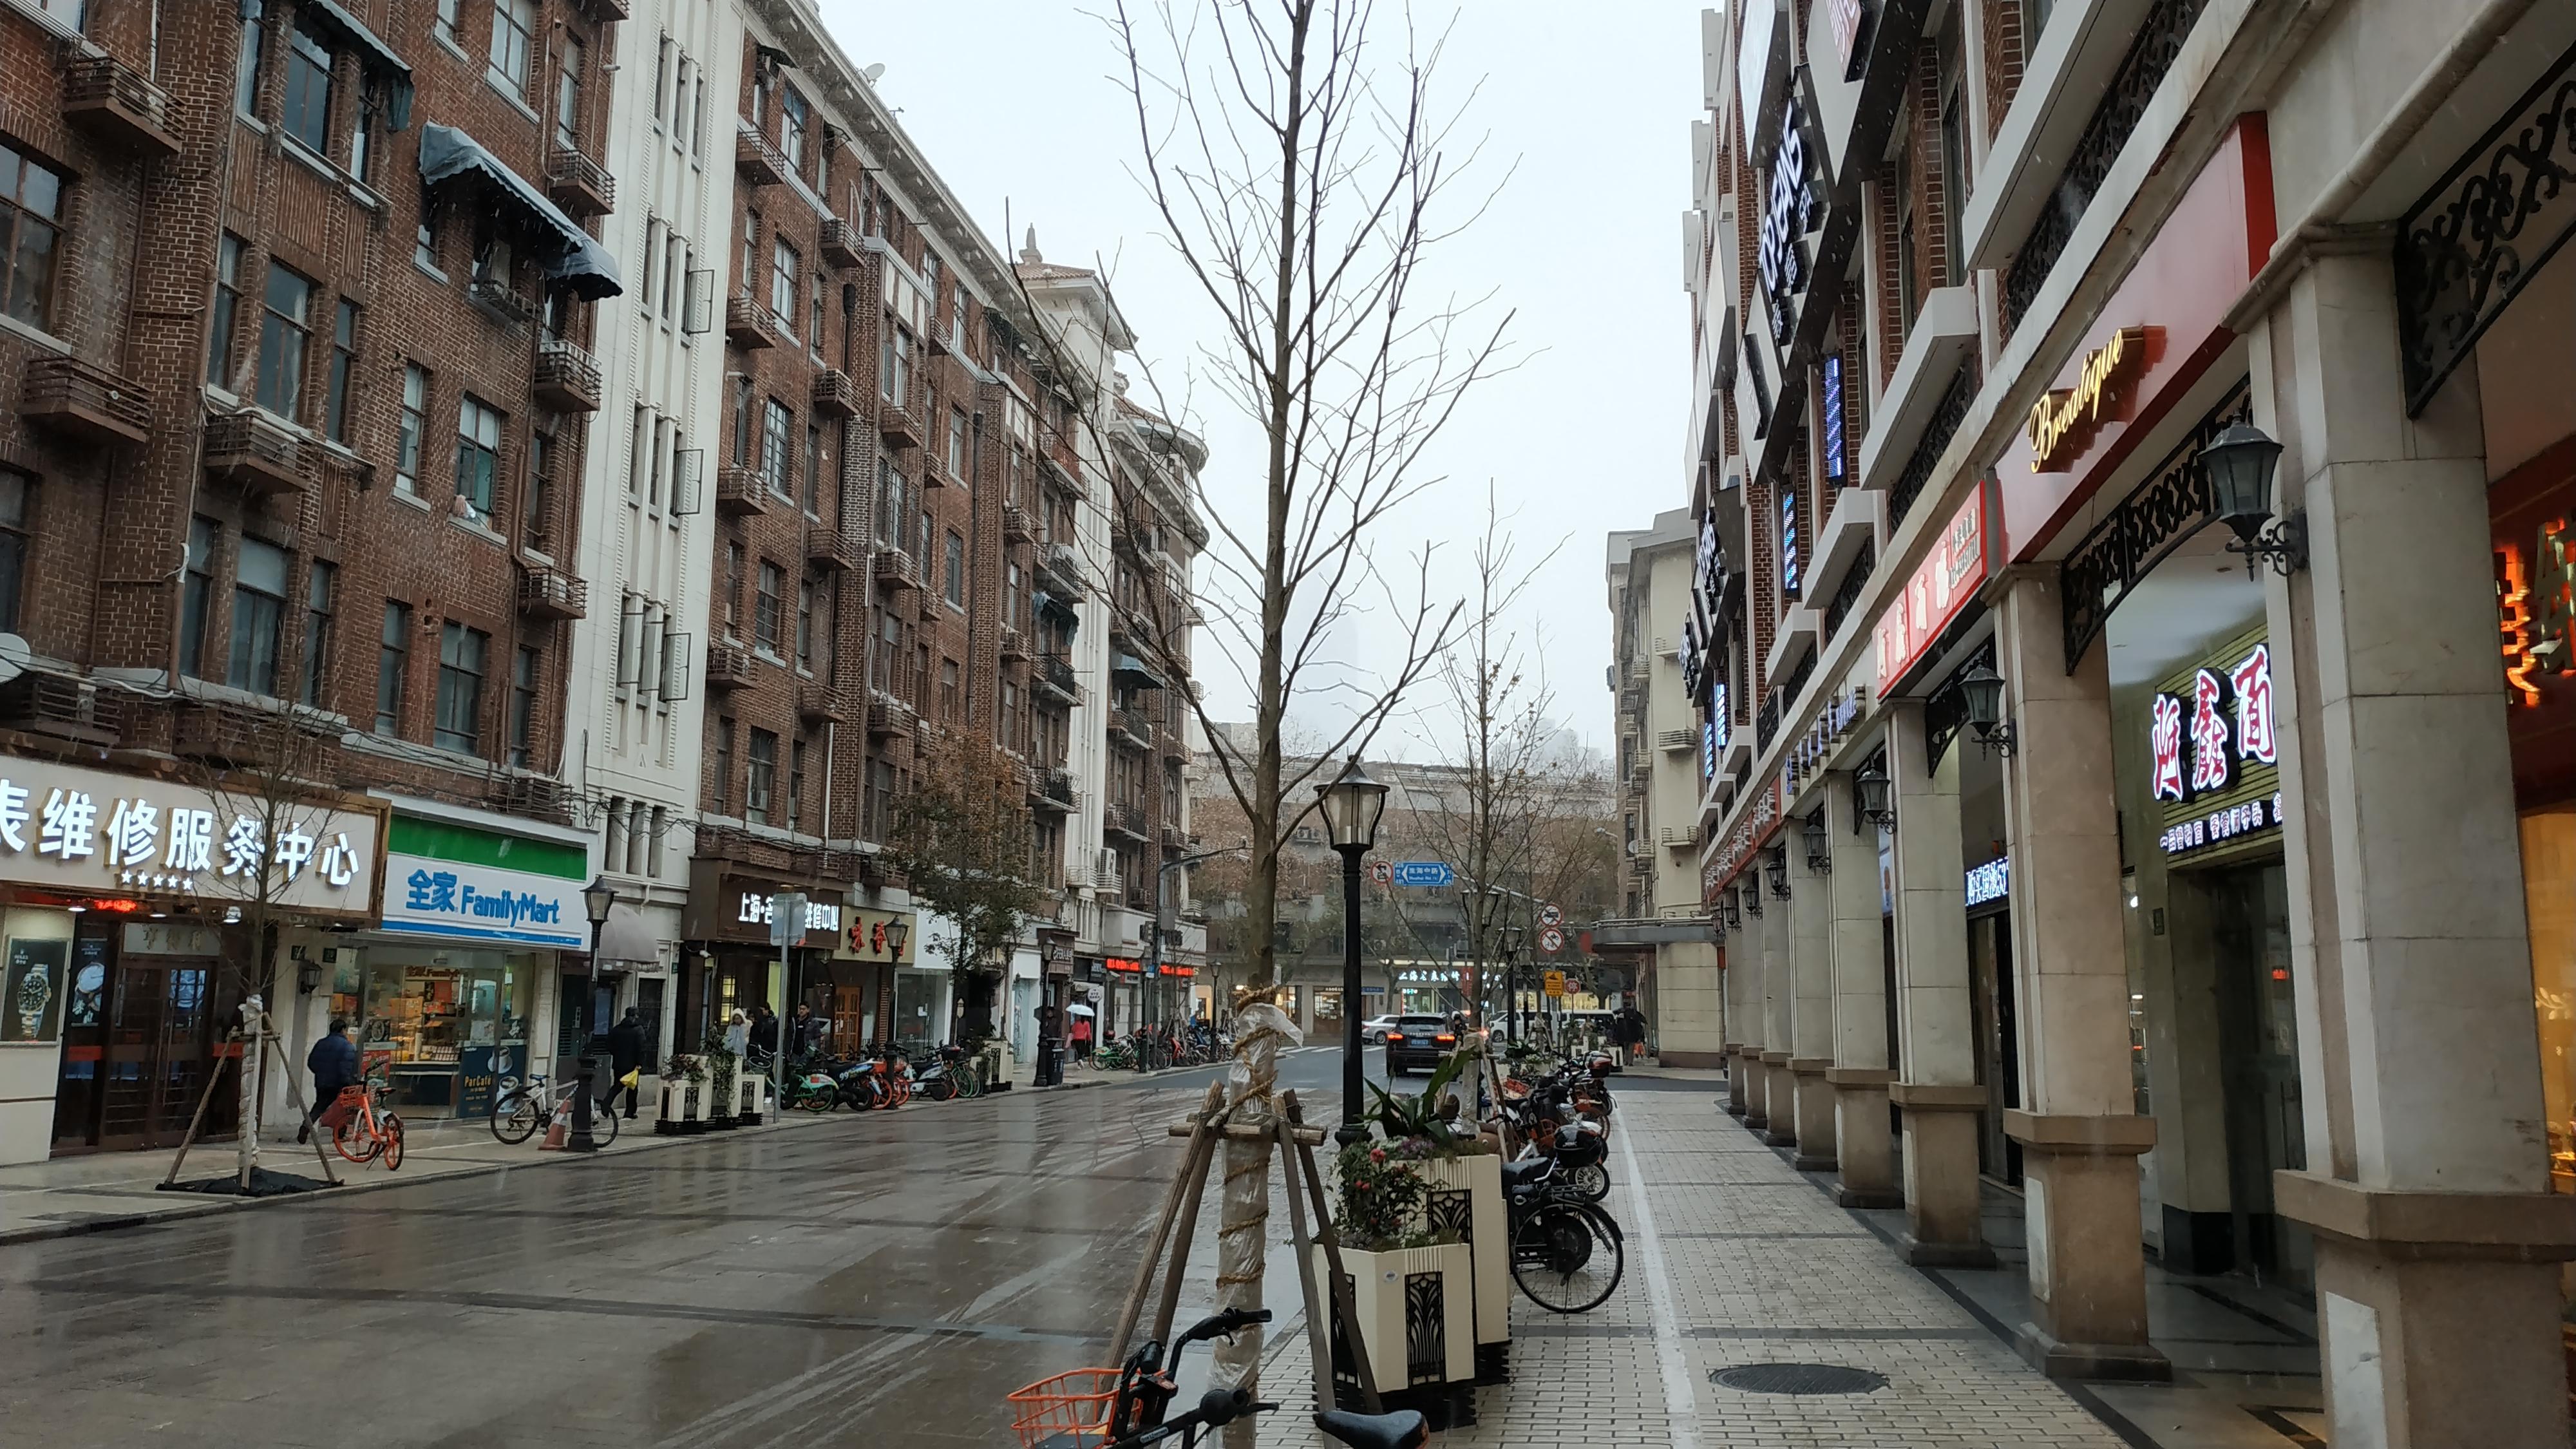 самый необычный и романтичный район между улицами Цзюйлу (Julu Rd.) и Хуайхай